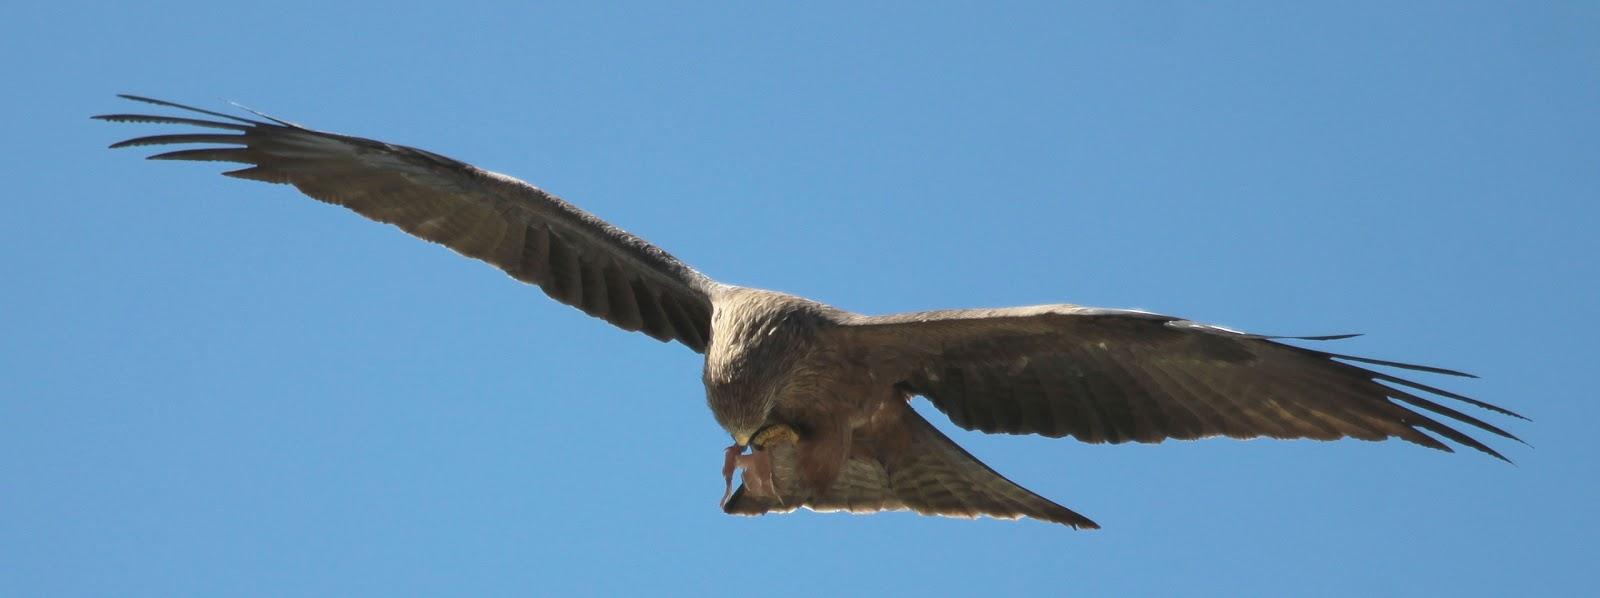 richard waring u0027s birds of australia kites around the backyard